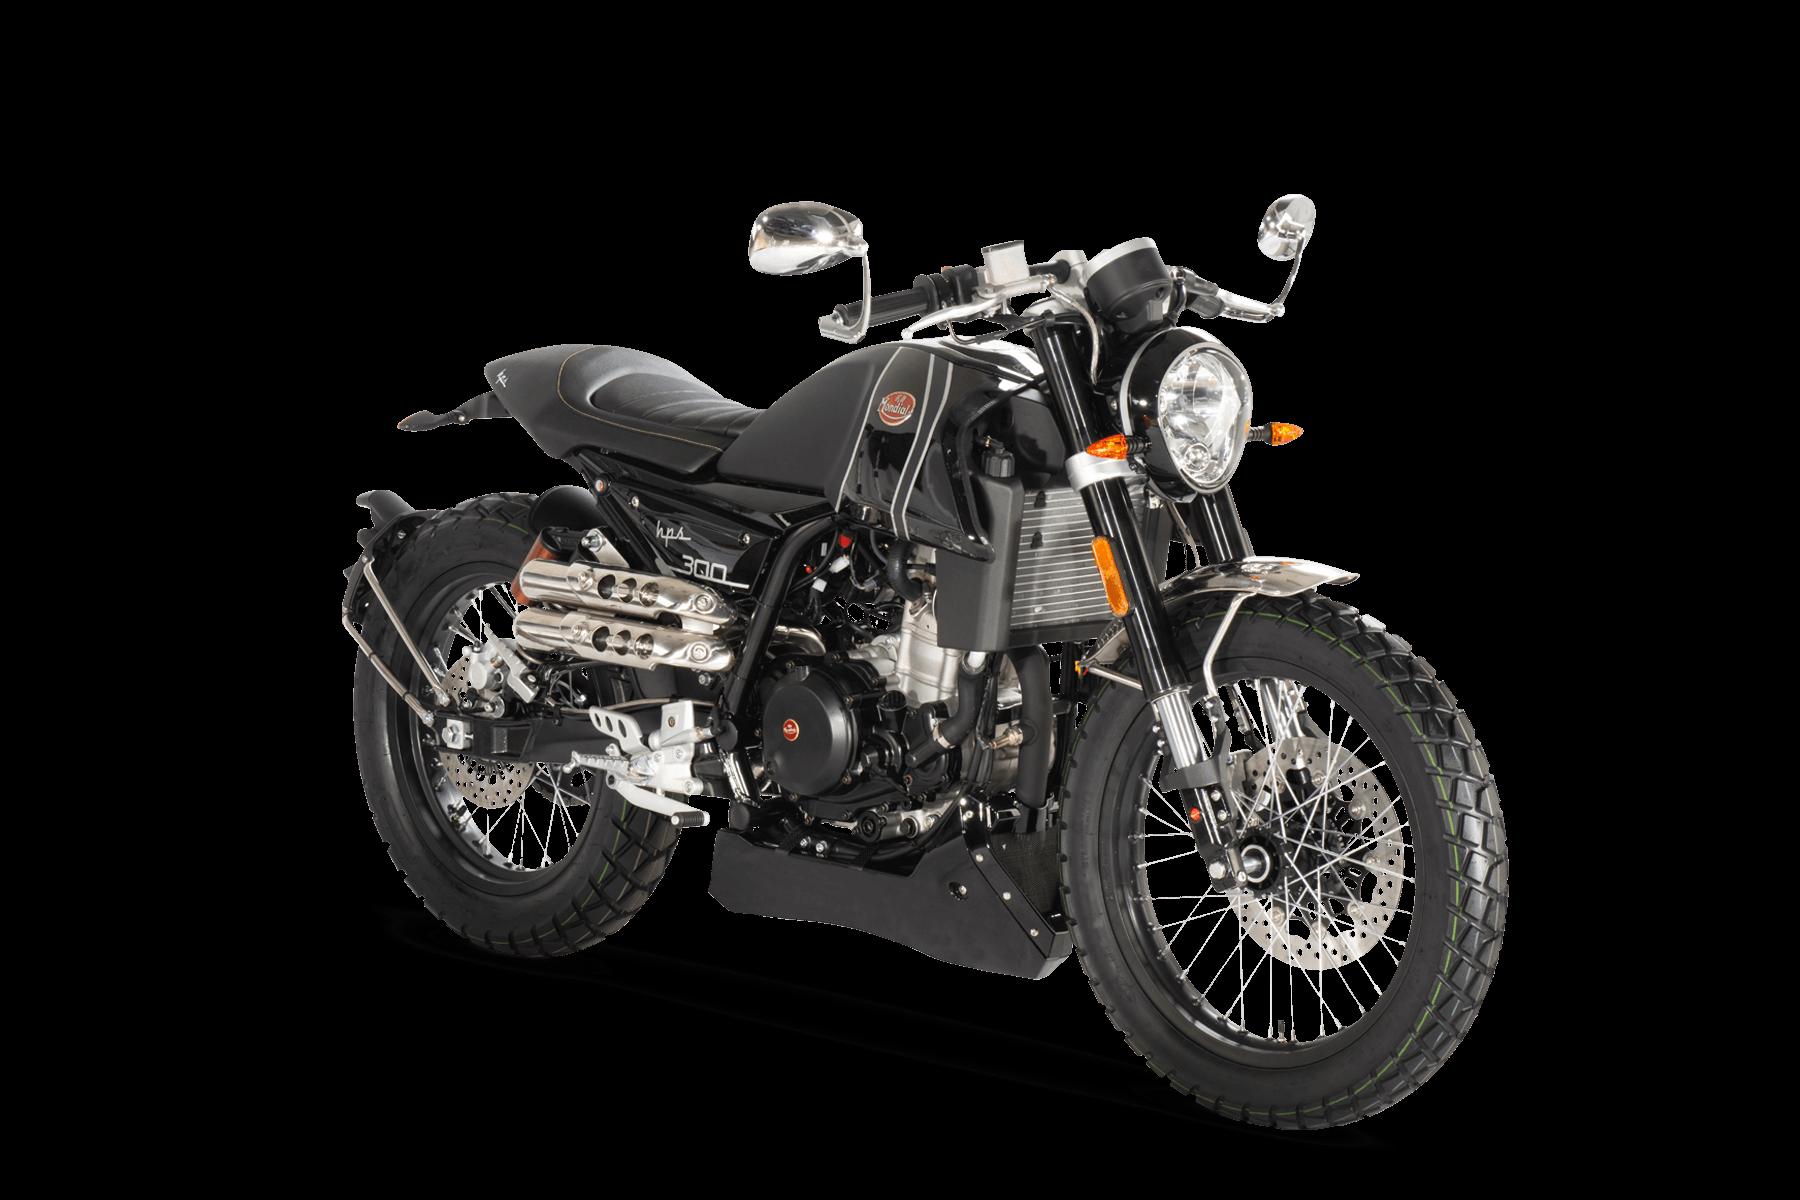 FB Mondial HPS 300i ABS – Detailverliebter Fahrgenuss